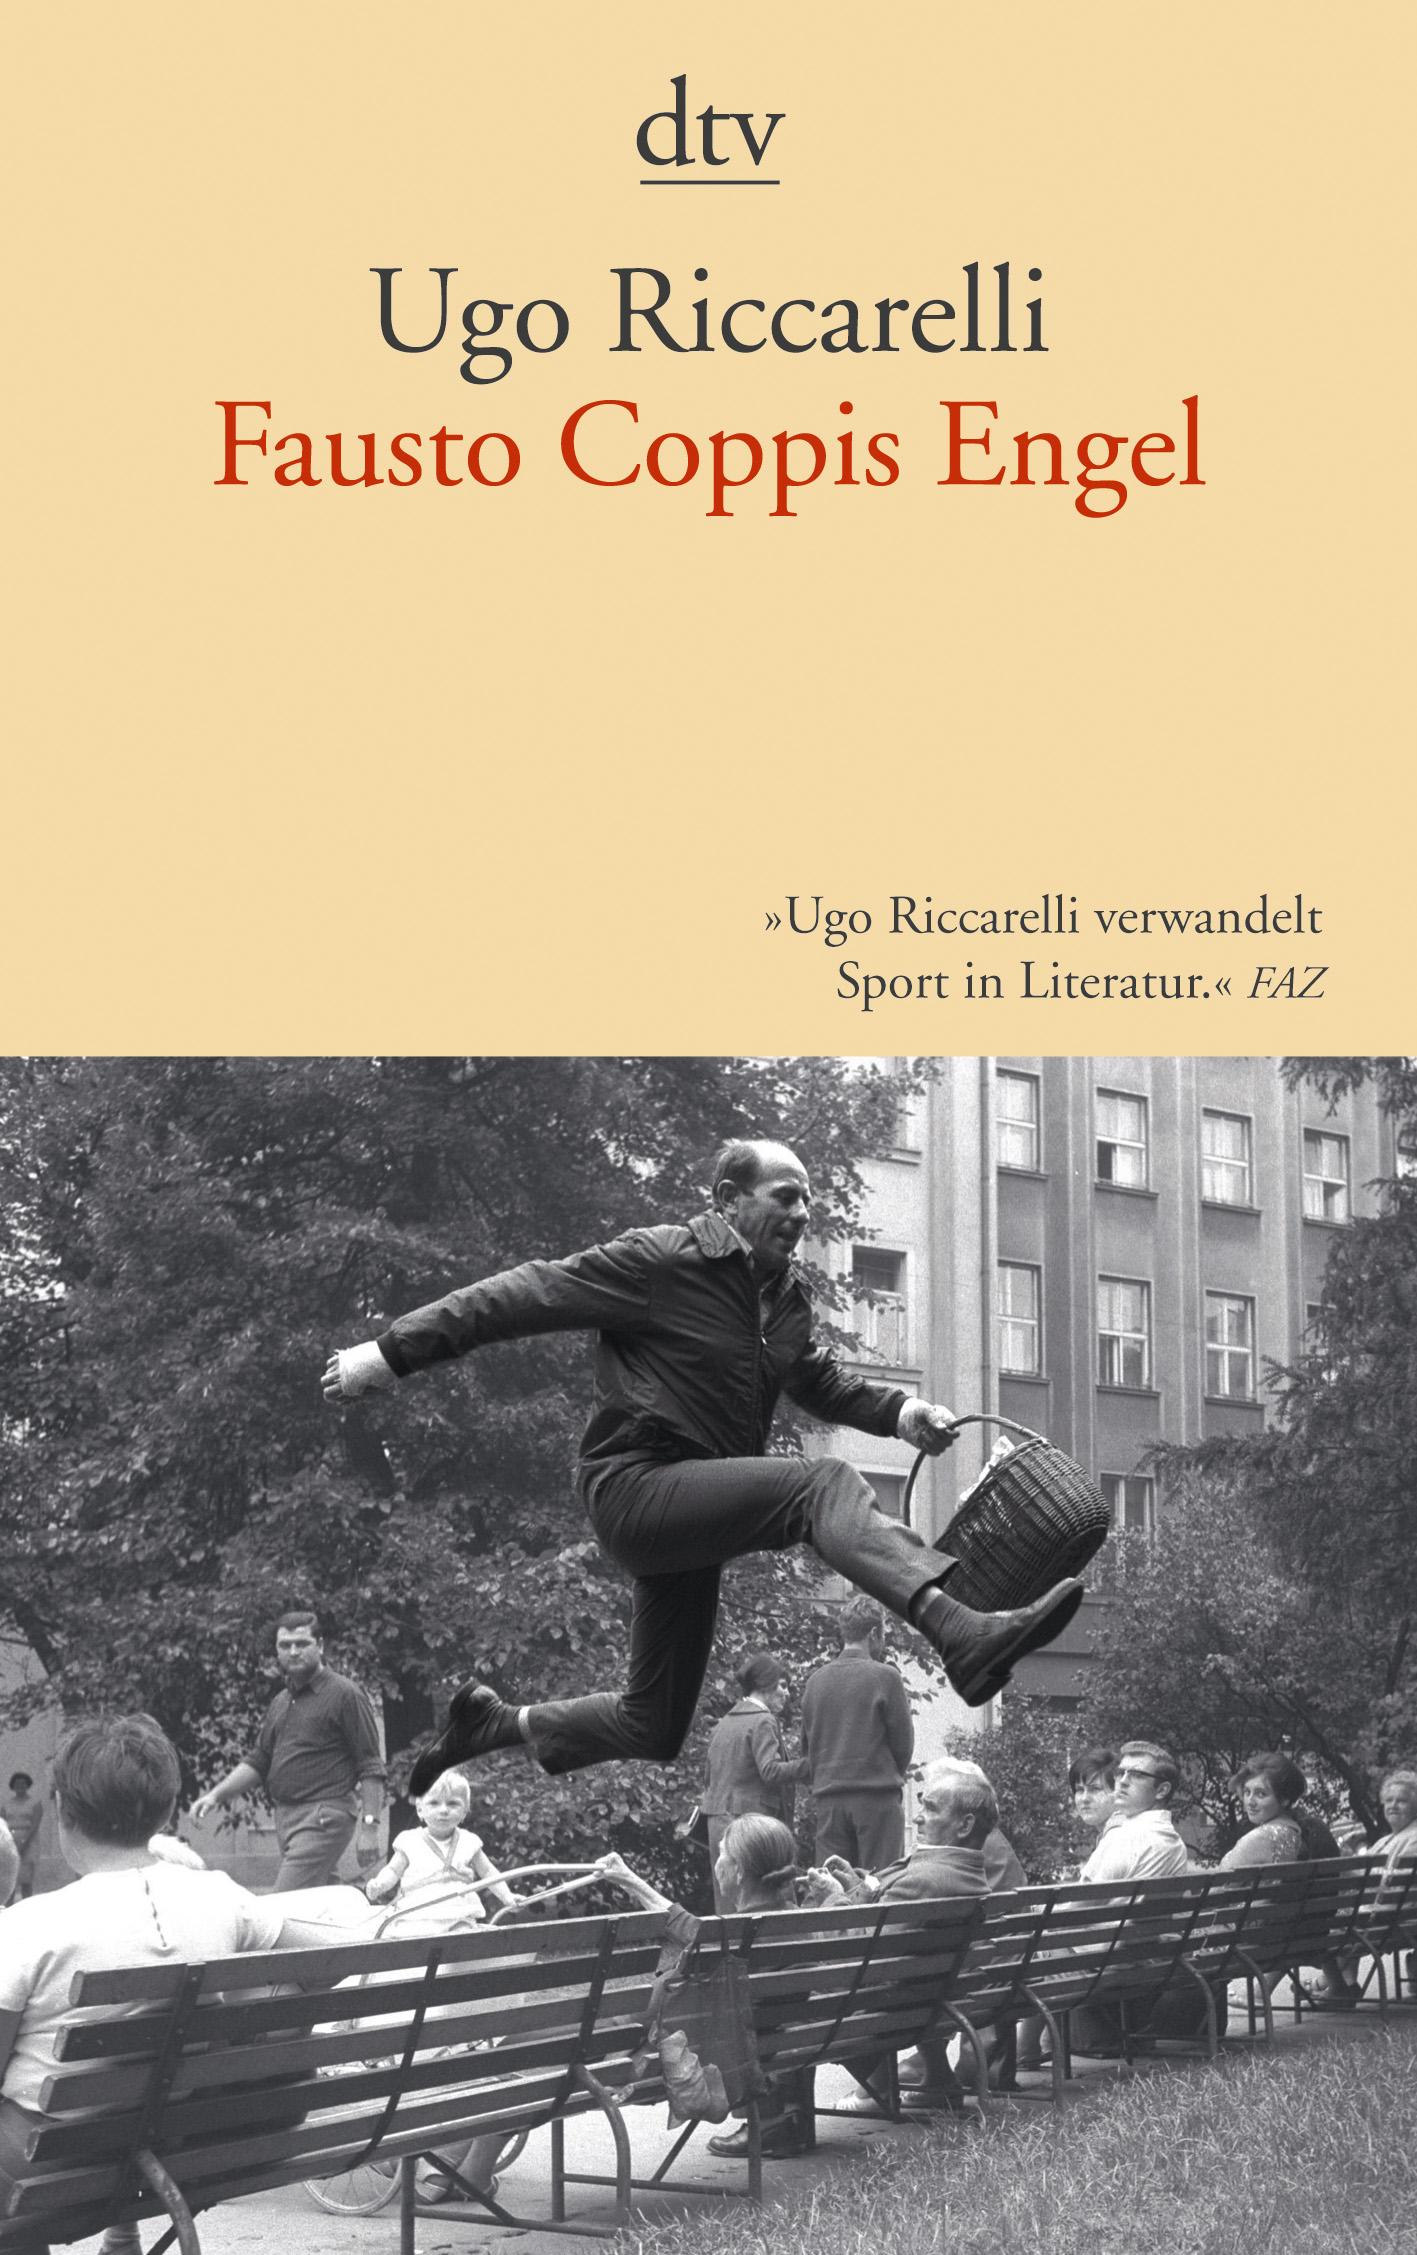 Fausto Coppis Engel